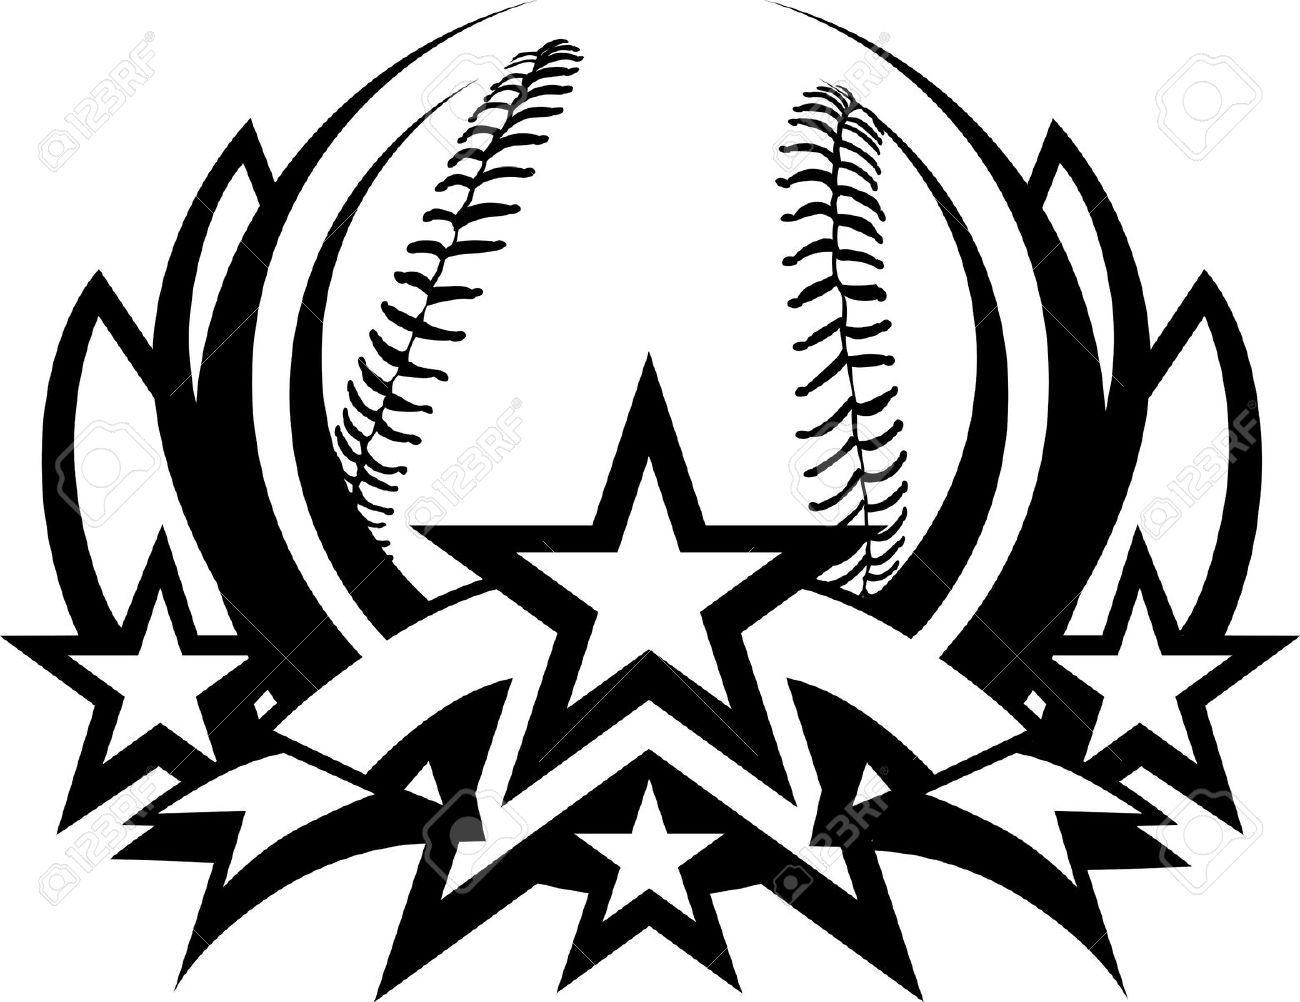 Black and white clipart of all star baseball logos.